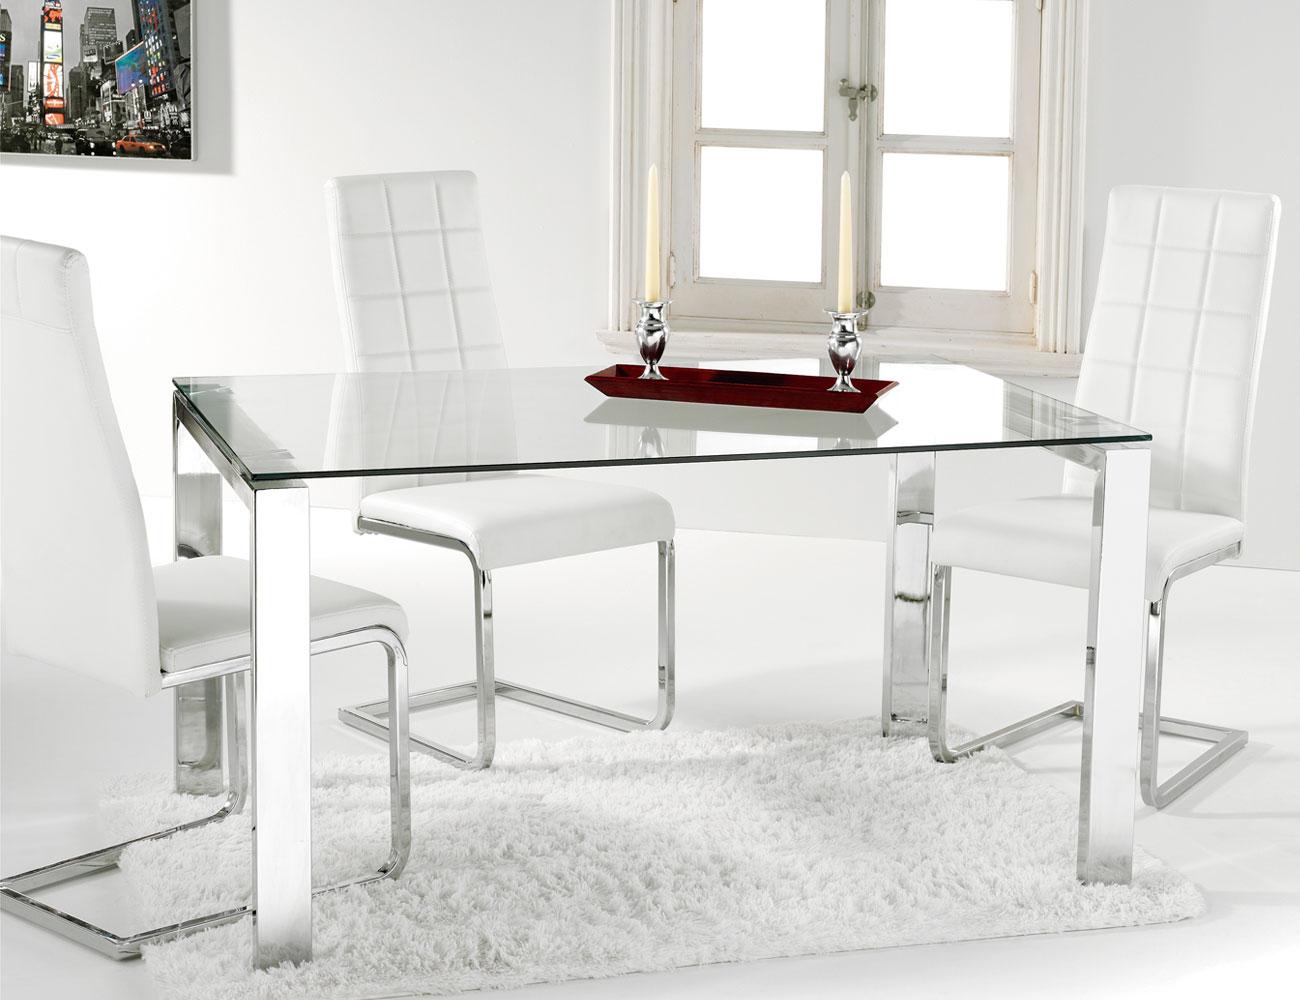 Mesa comedor cristal templado con patas cromadas factory for Comedor de cristal